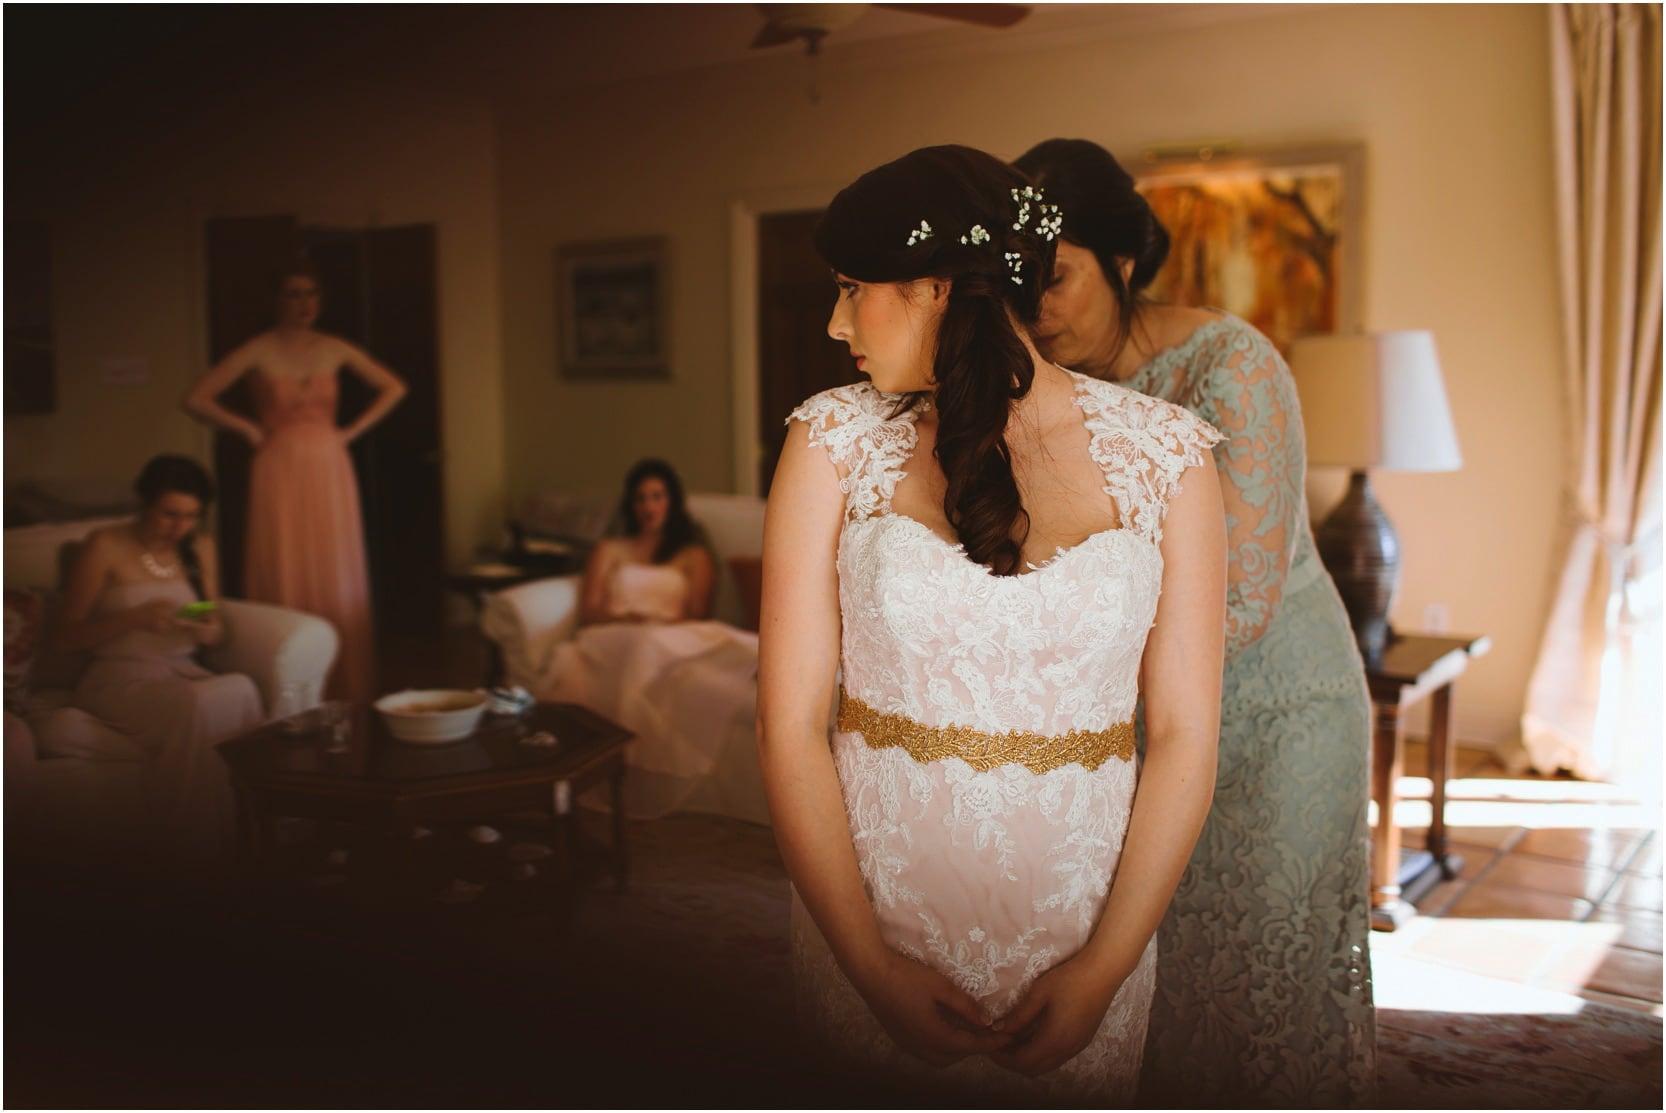 naomijacob_covington_wedding__80_blogstomped